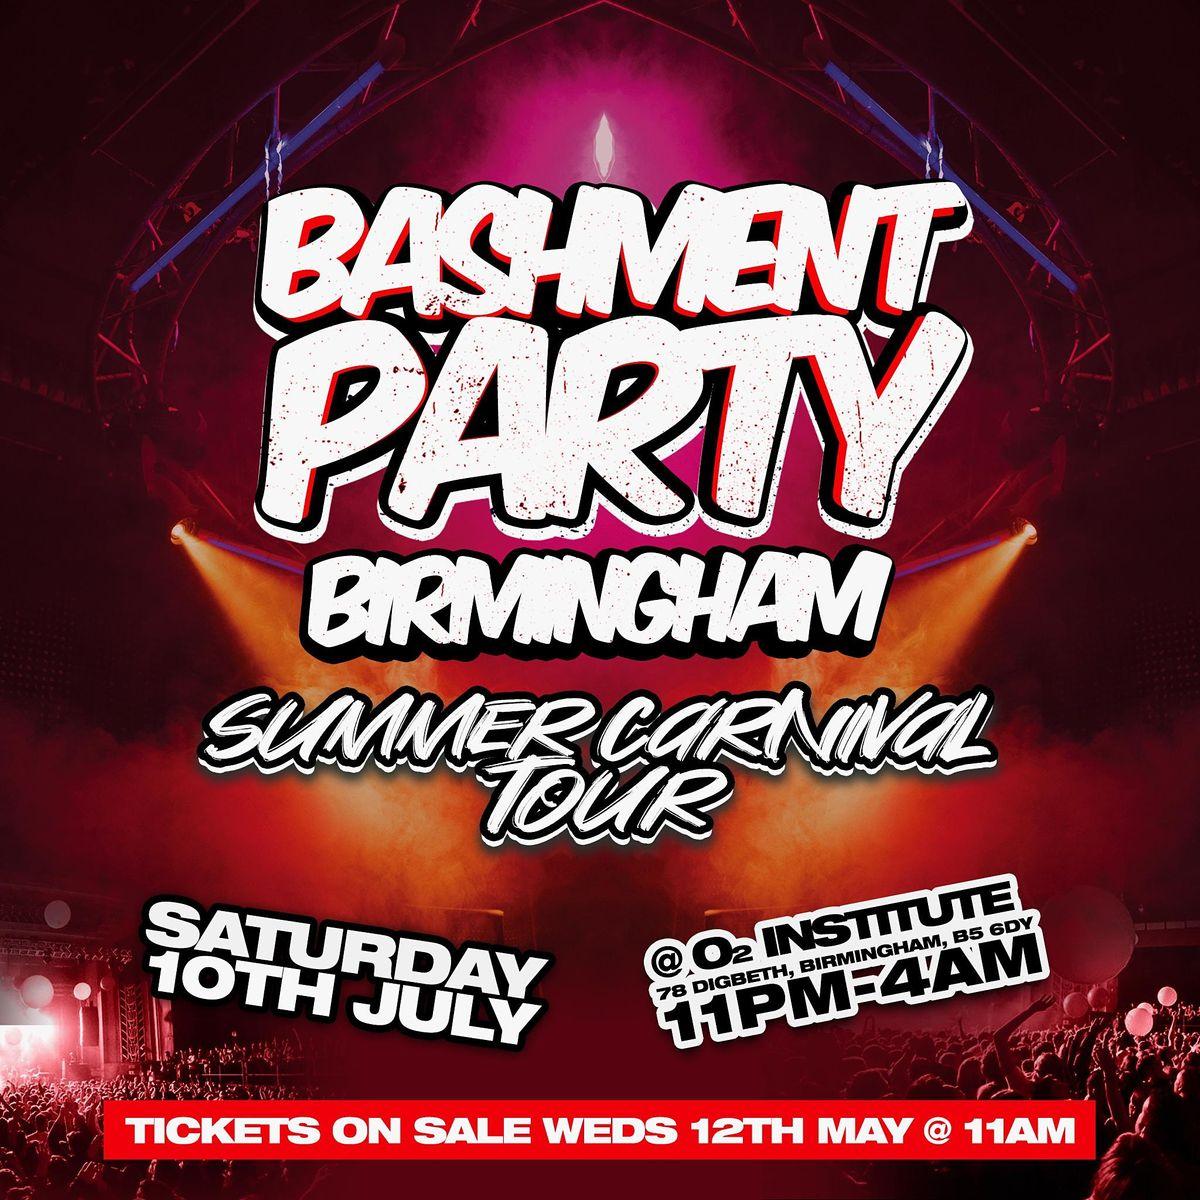 Bashment Party Birmingham - Summer Carnival